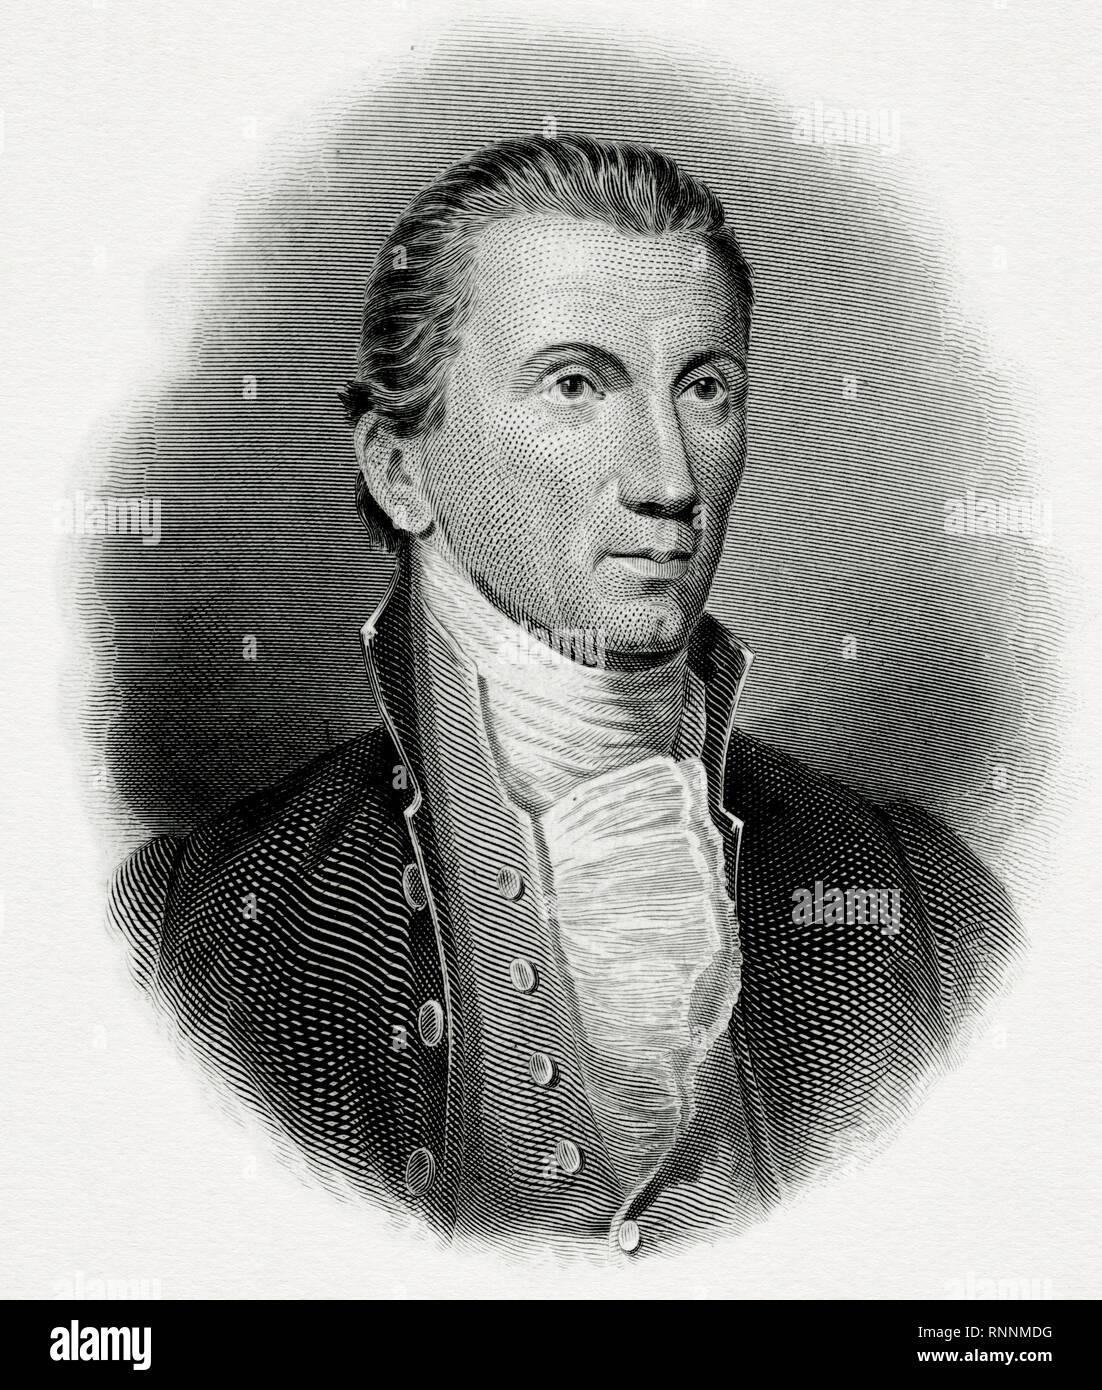 Portrait of President James Monroe, circa 1819 - Stock Image